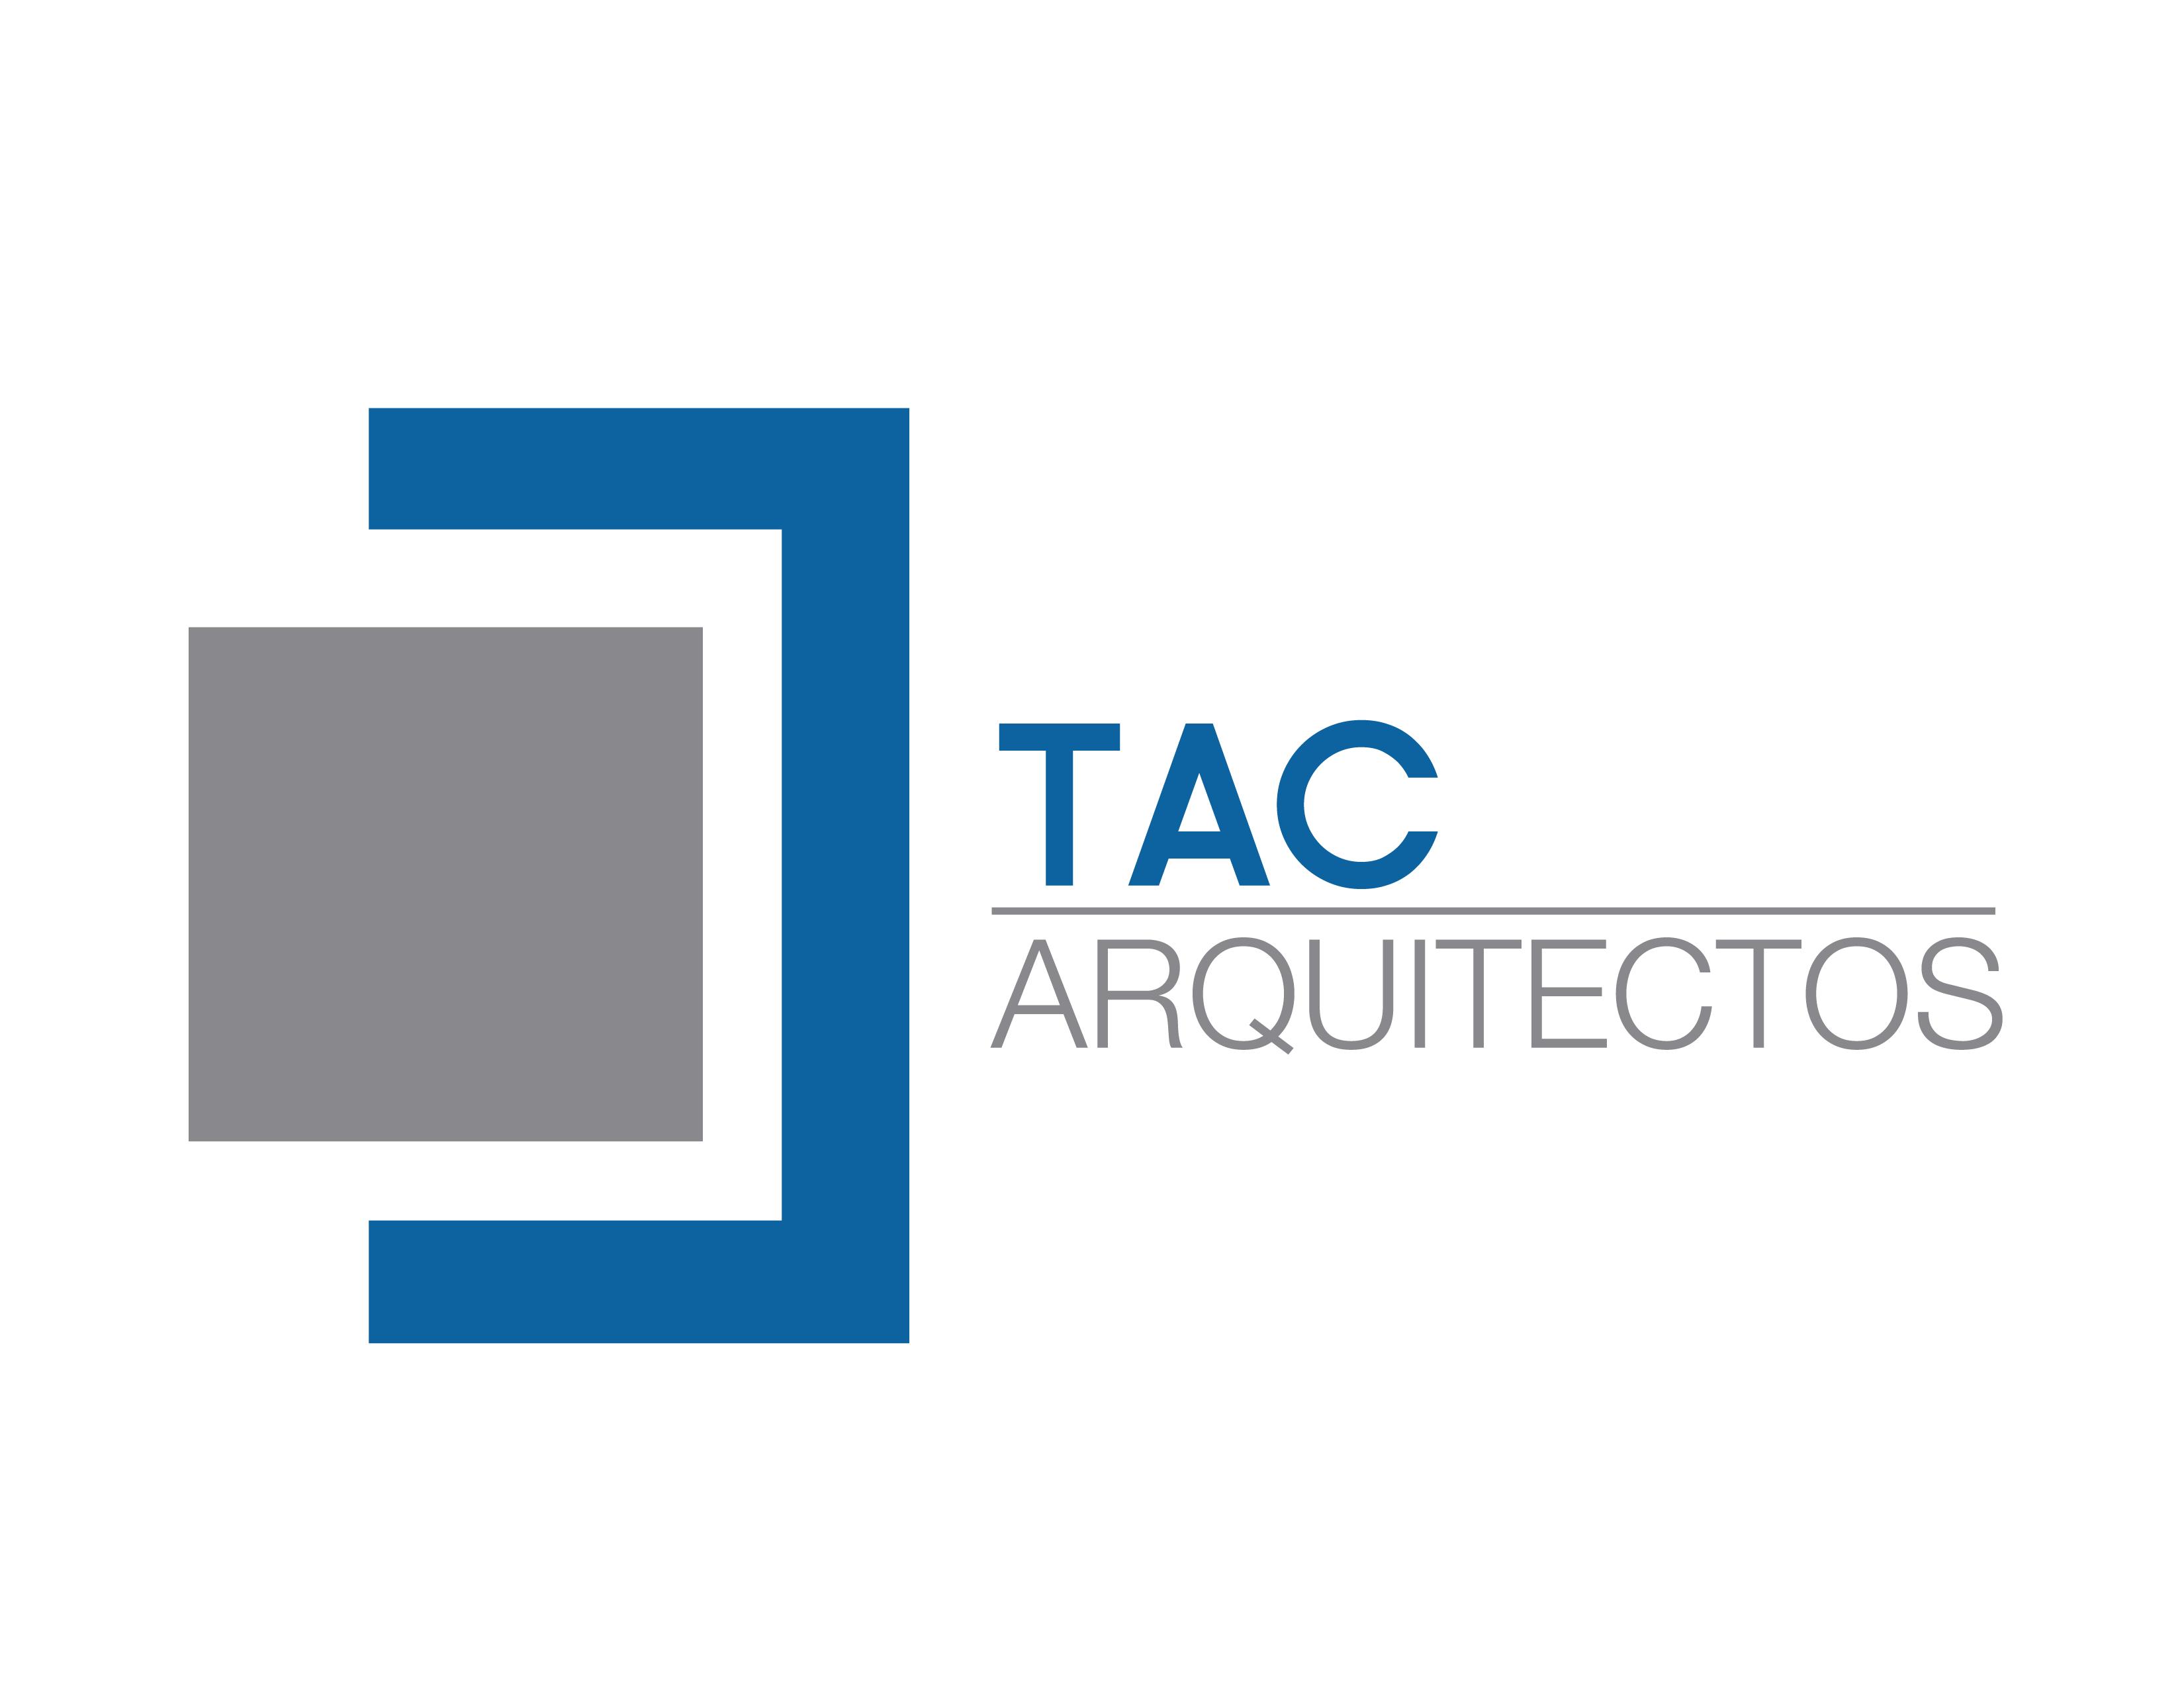 Tac Arquitectos